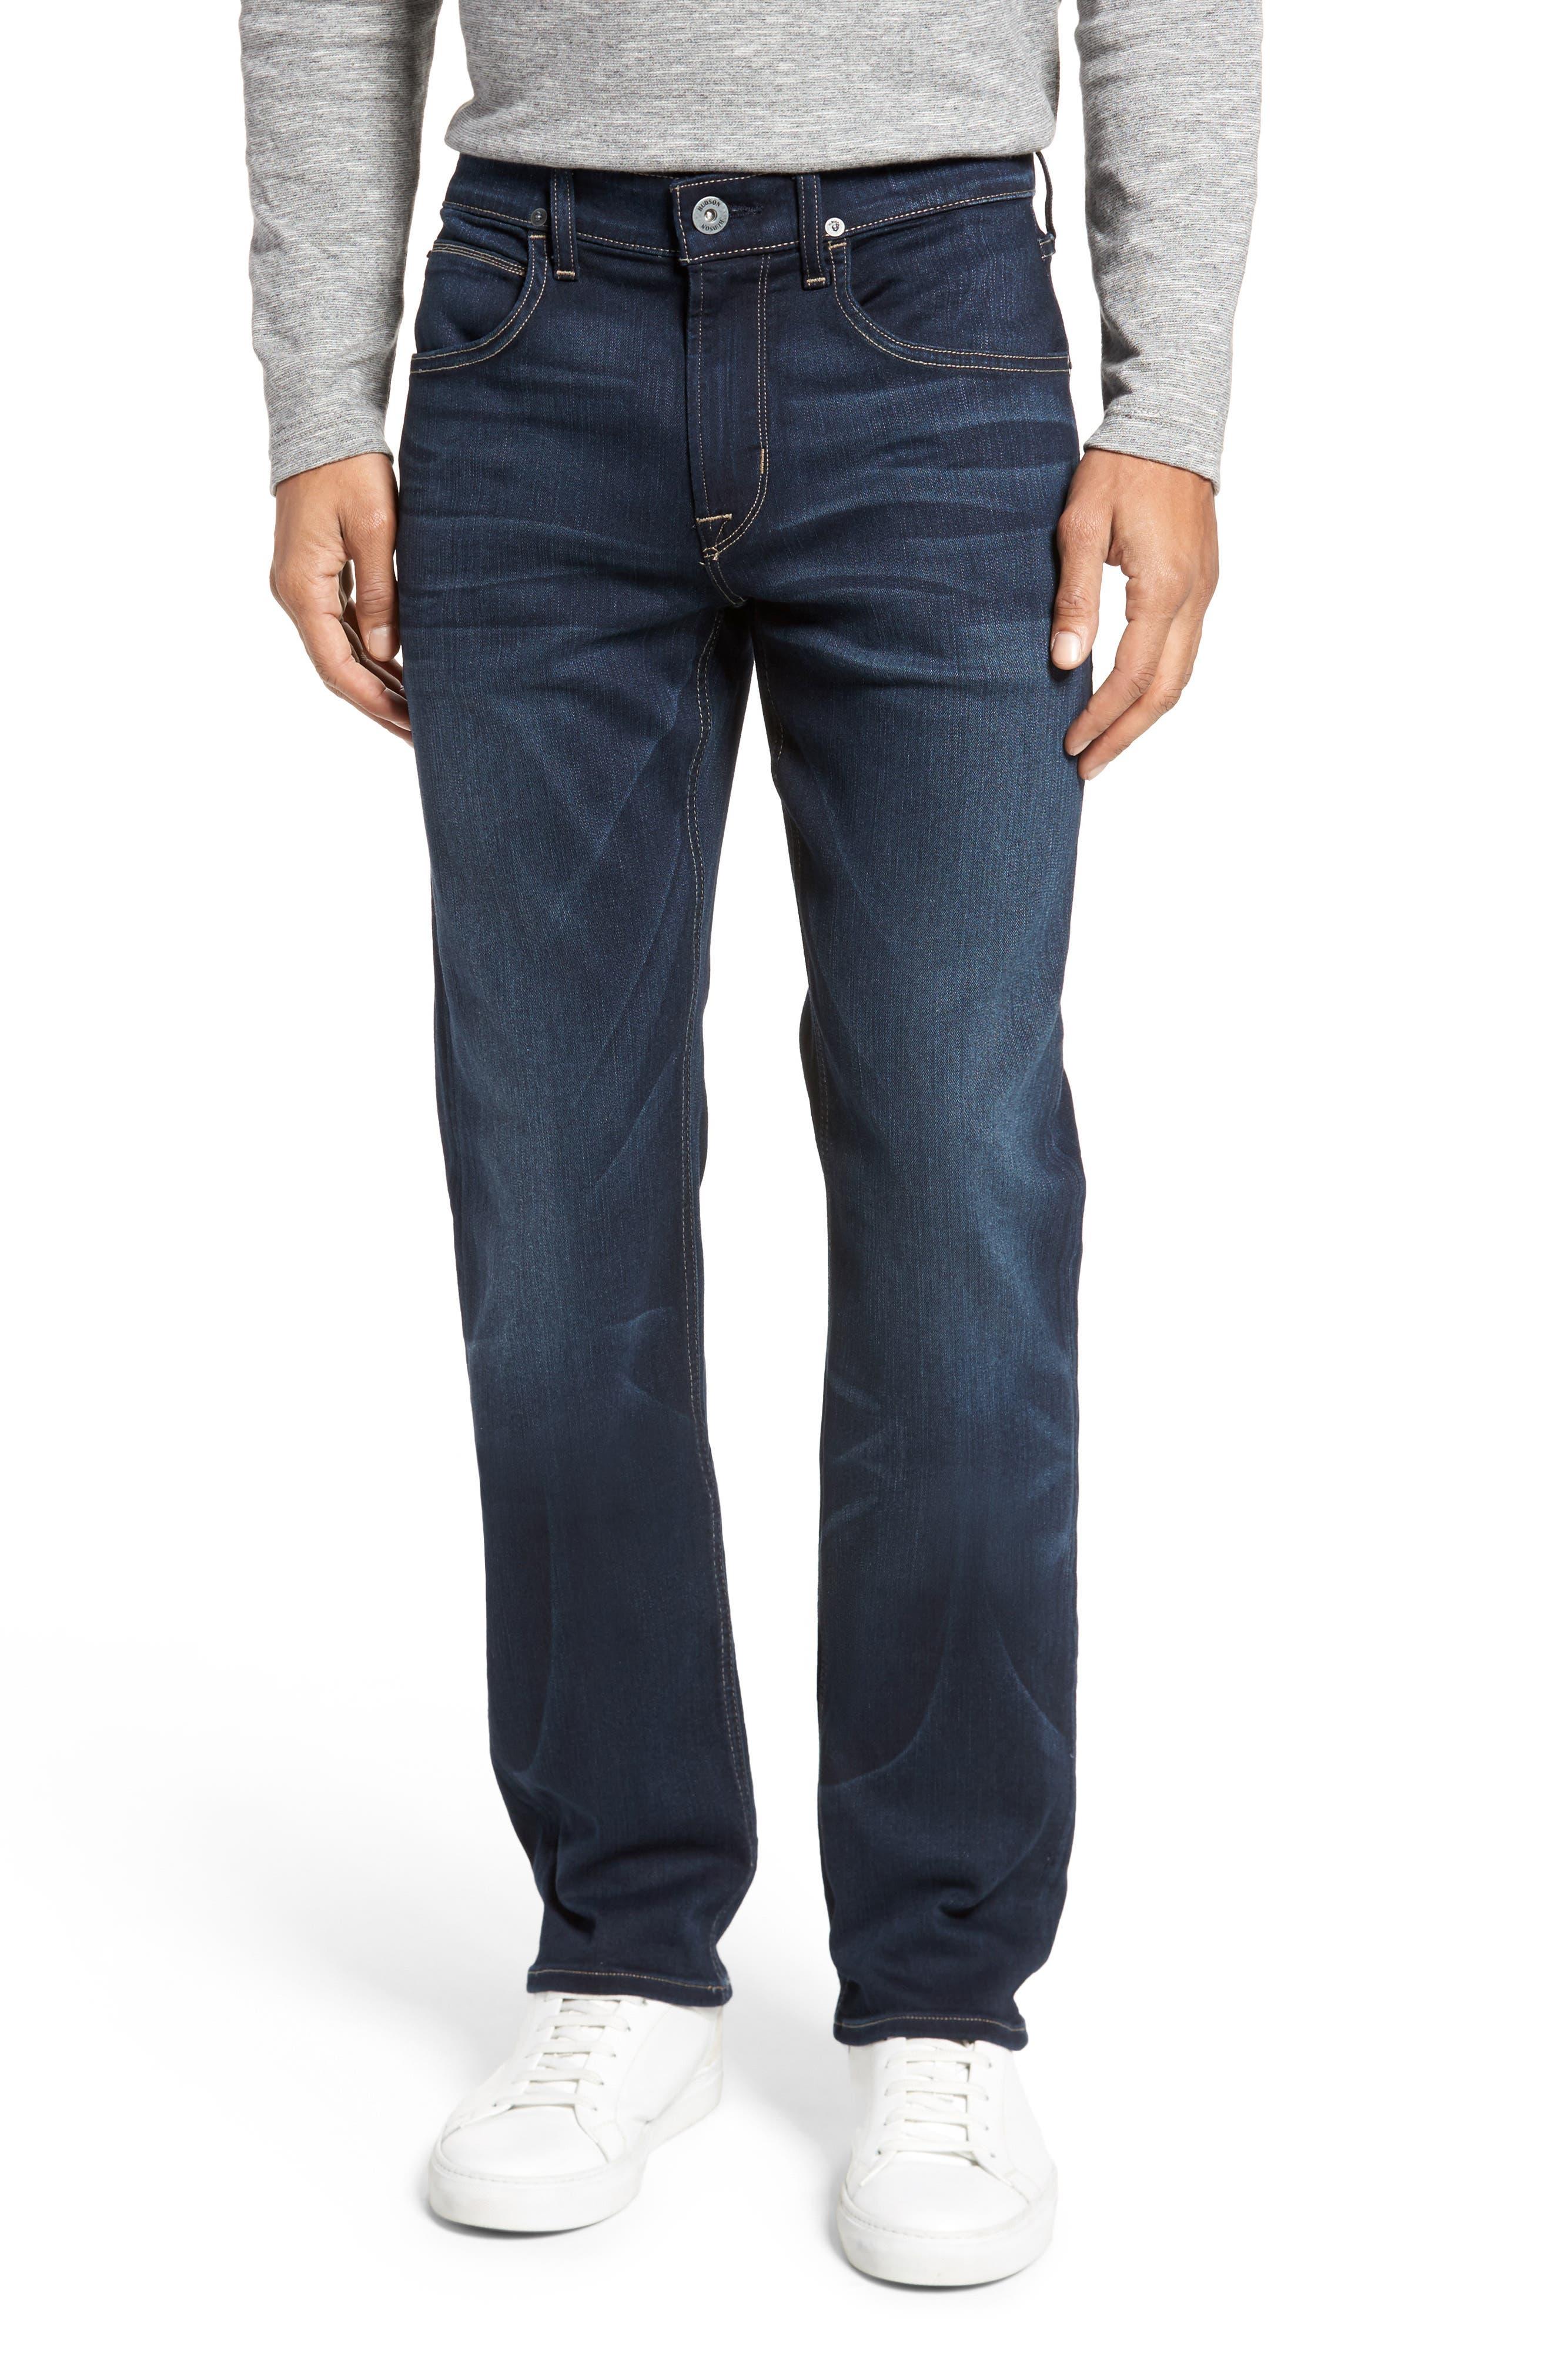 Alternate Image 1 Selected - Hudson Jeans Byron Slim Straight Fit Jeans (Newburyport)